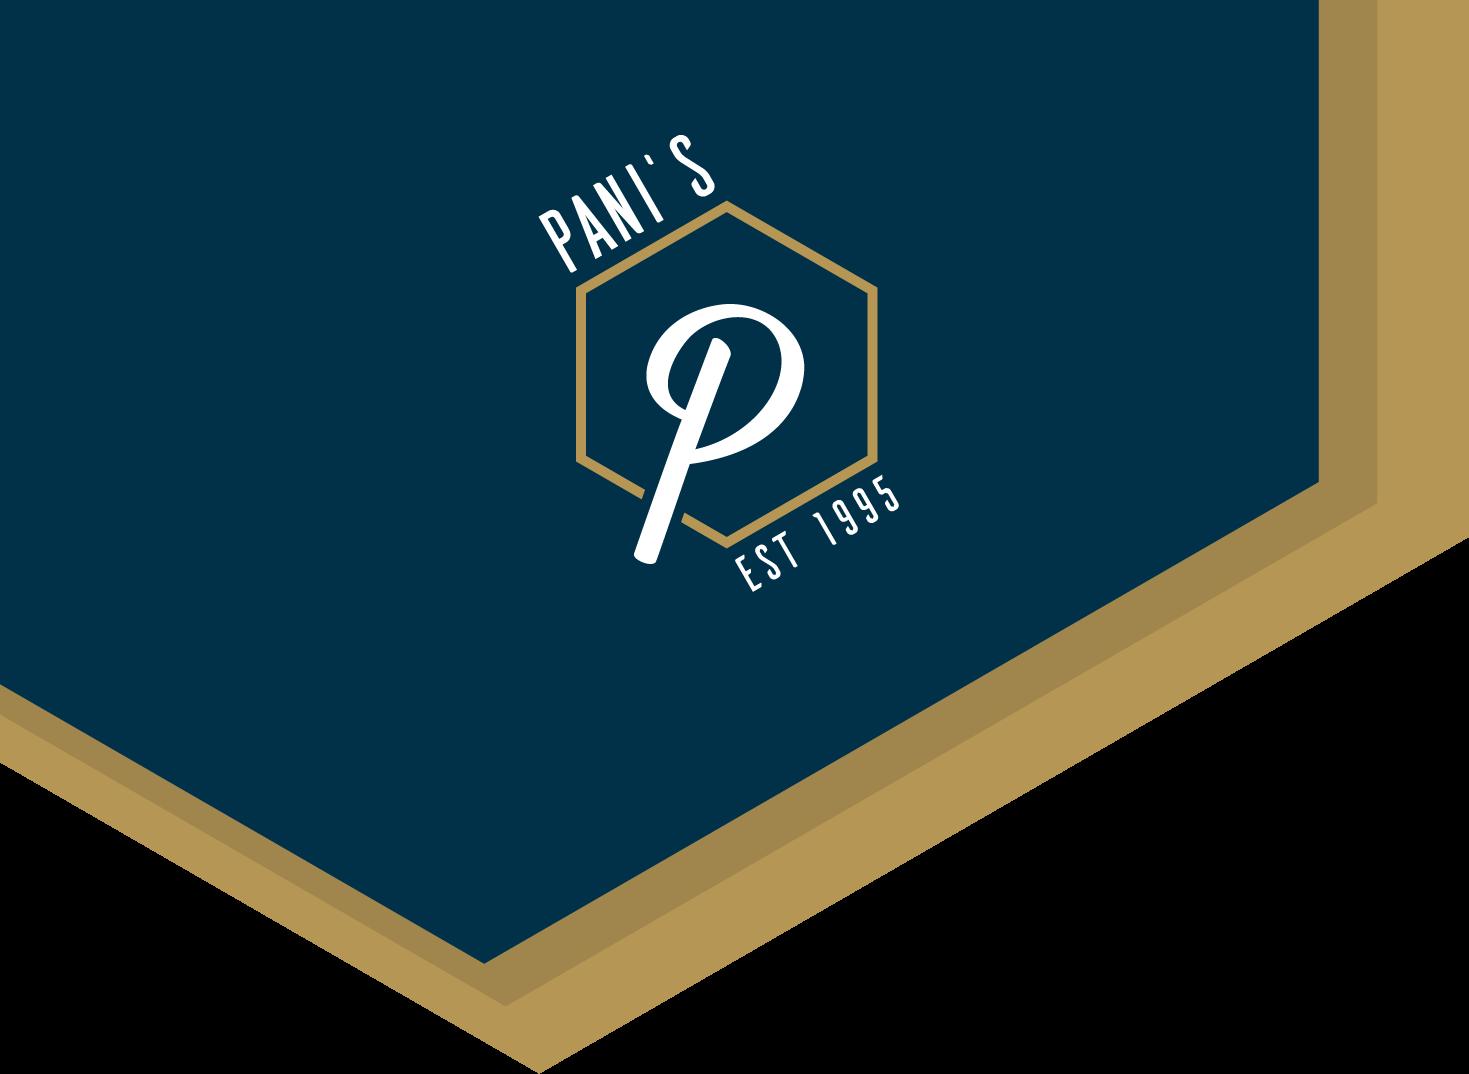 Pani's Cafe